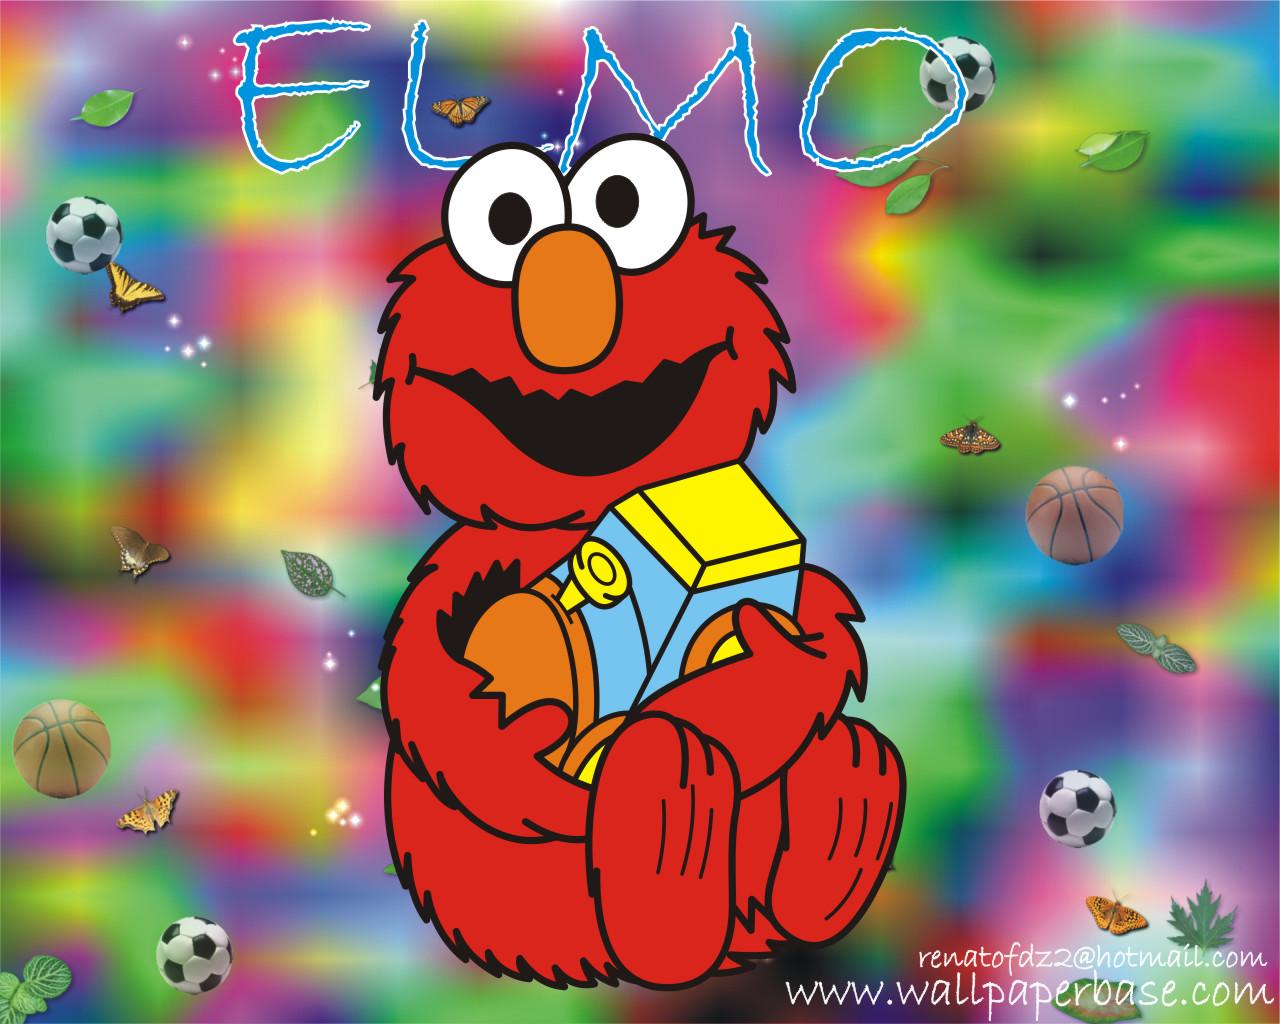 You are viewing the cartoons sesamestreet wallpaper named Sesame street 1.